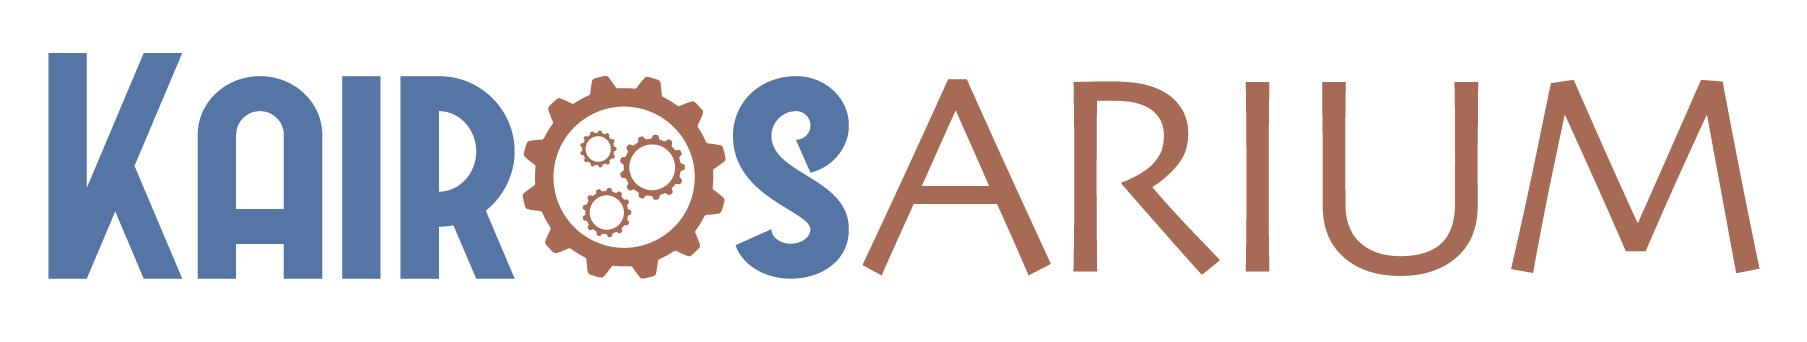 Kairosarium logo